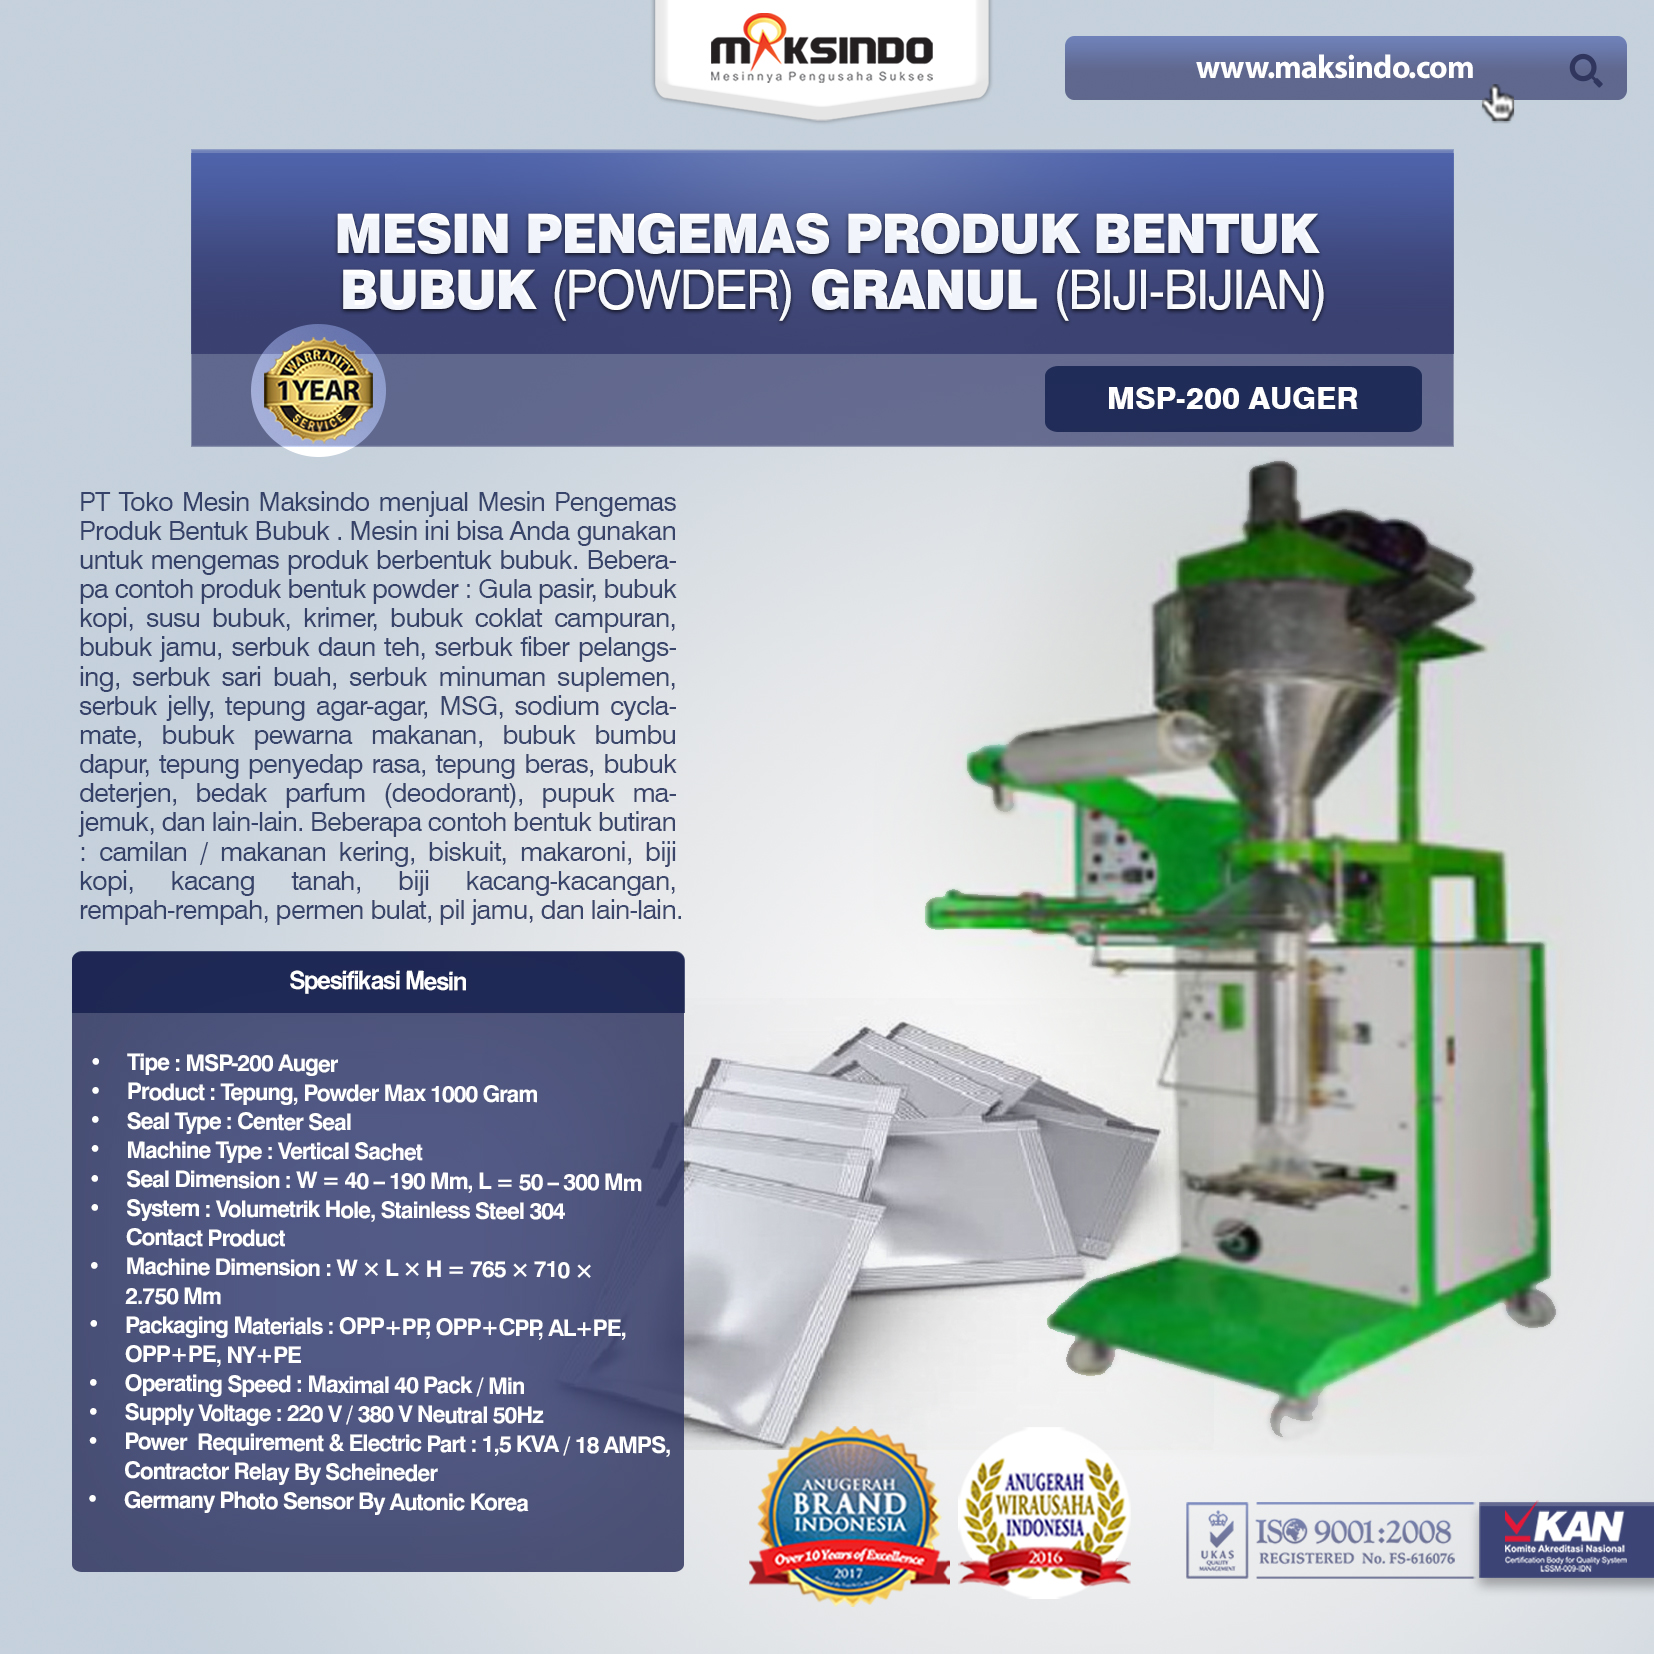 Mesin Pengemas Produk Bentuk BUBUK (POWDER) GRANUL (BIJI-BIJIAN) MSP-200 Auger